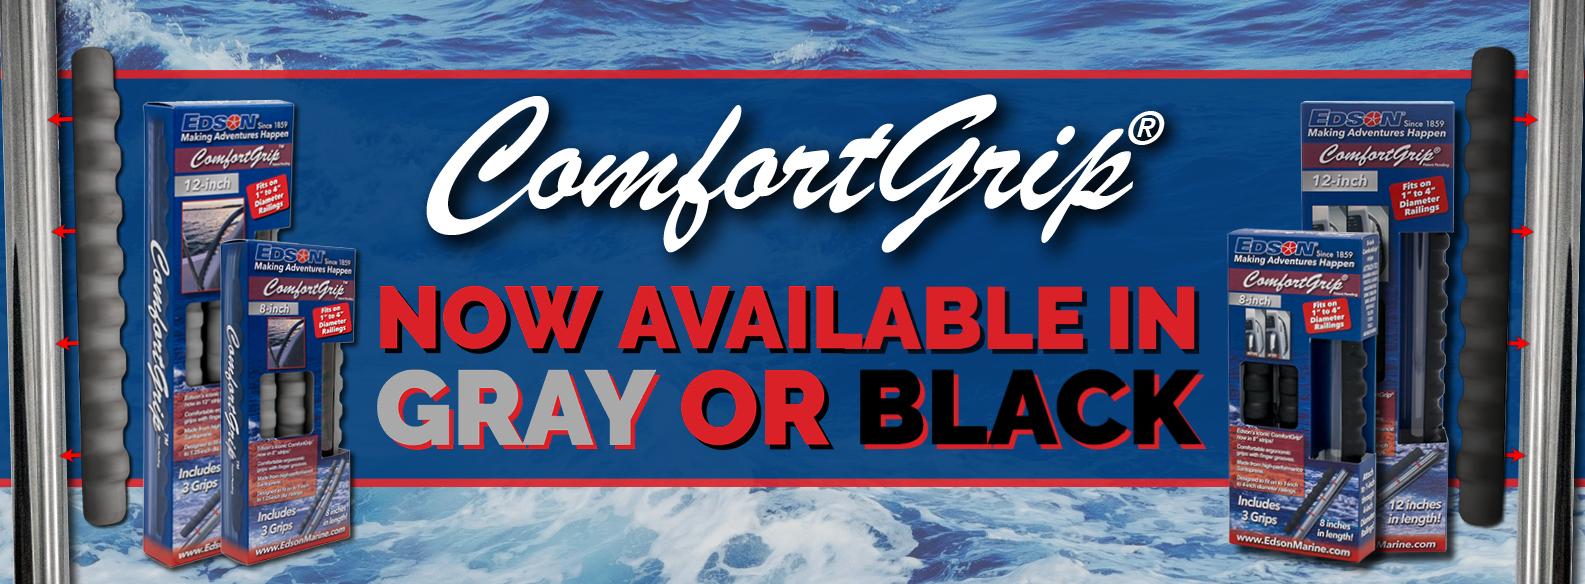 comfortgrip-product-page-grey-black-v2.jpg